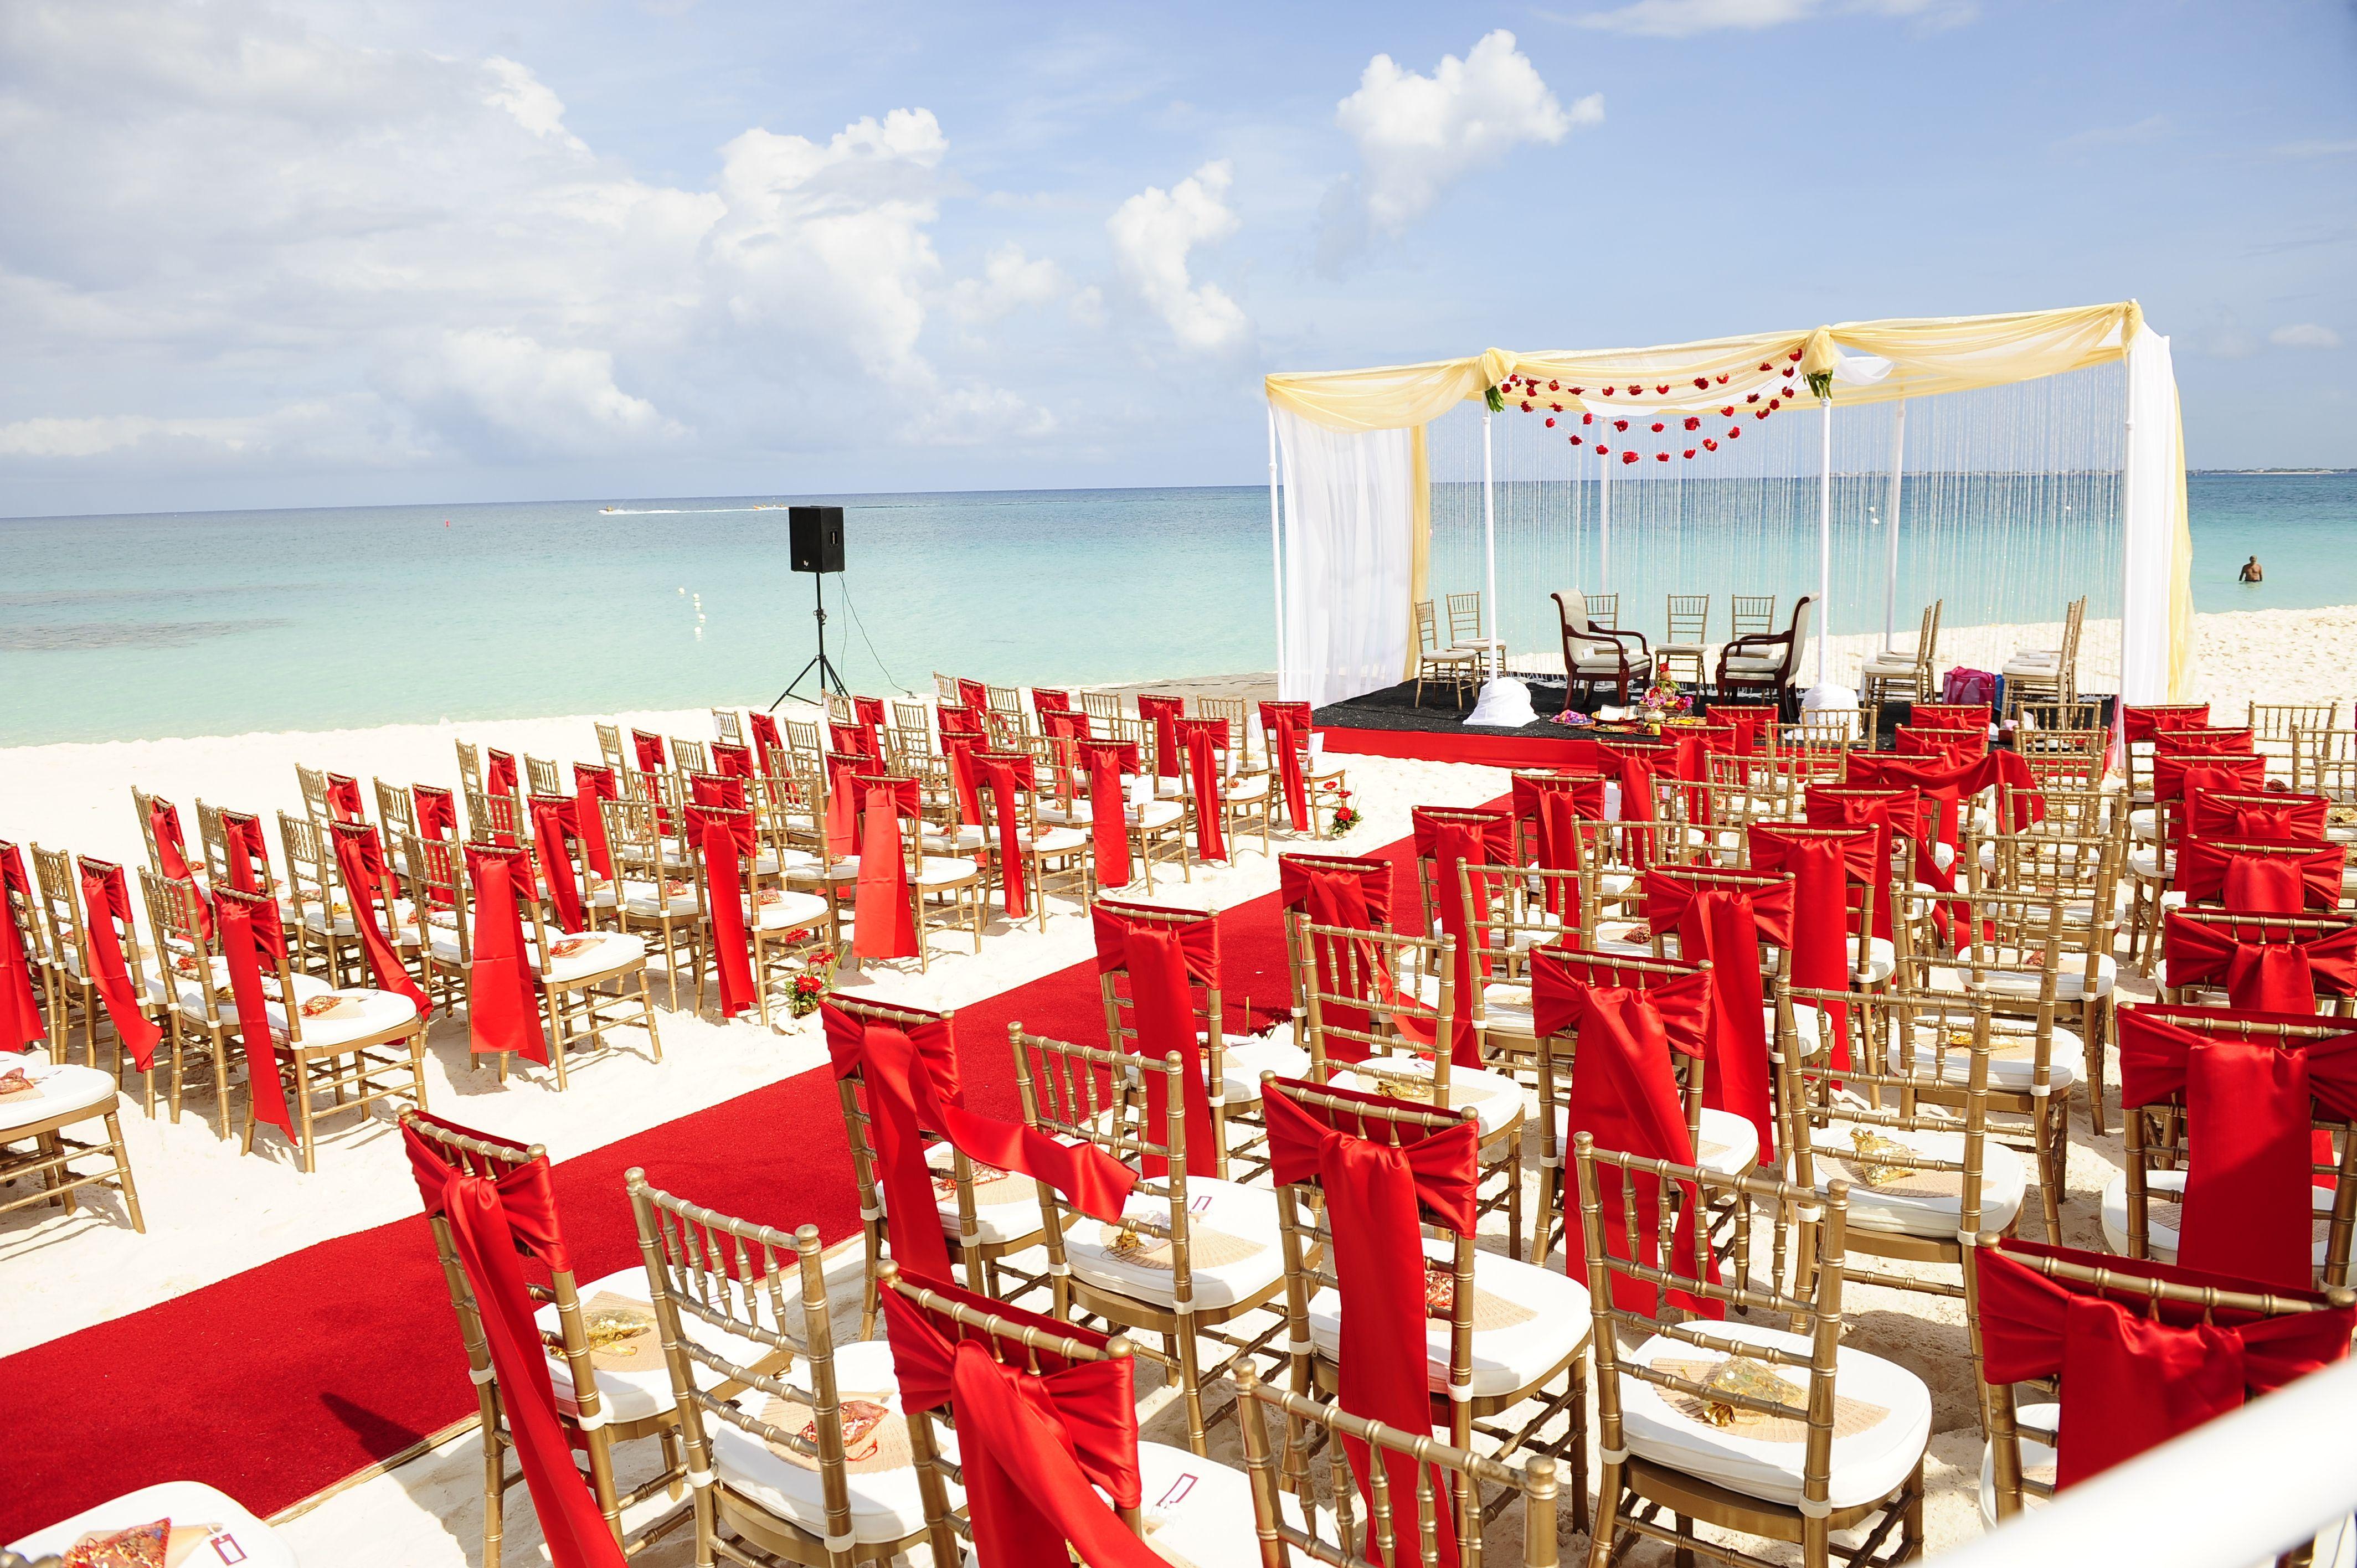 Aekta Jignesh Wedding Ceremony On World Famous Seven Mile Beach